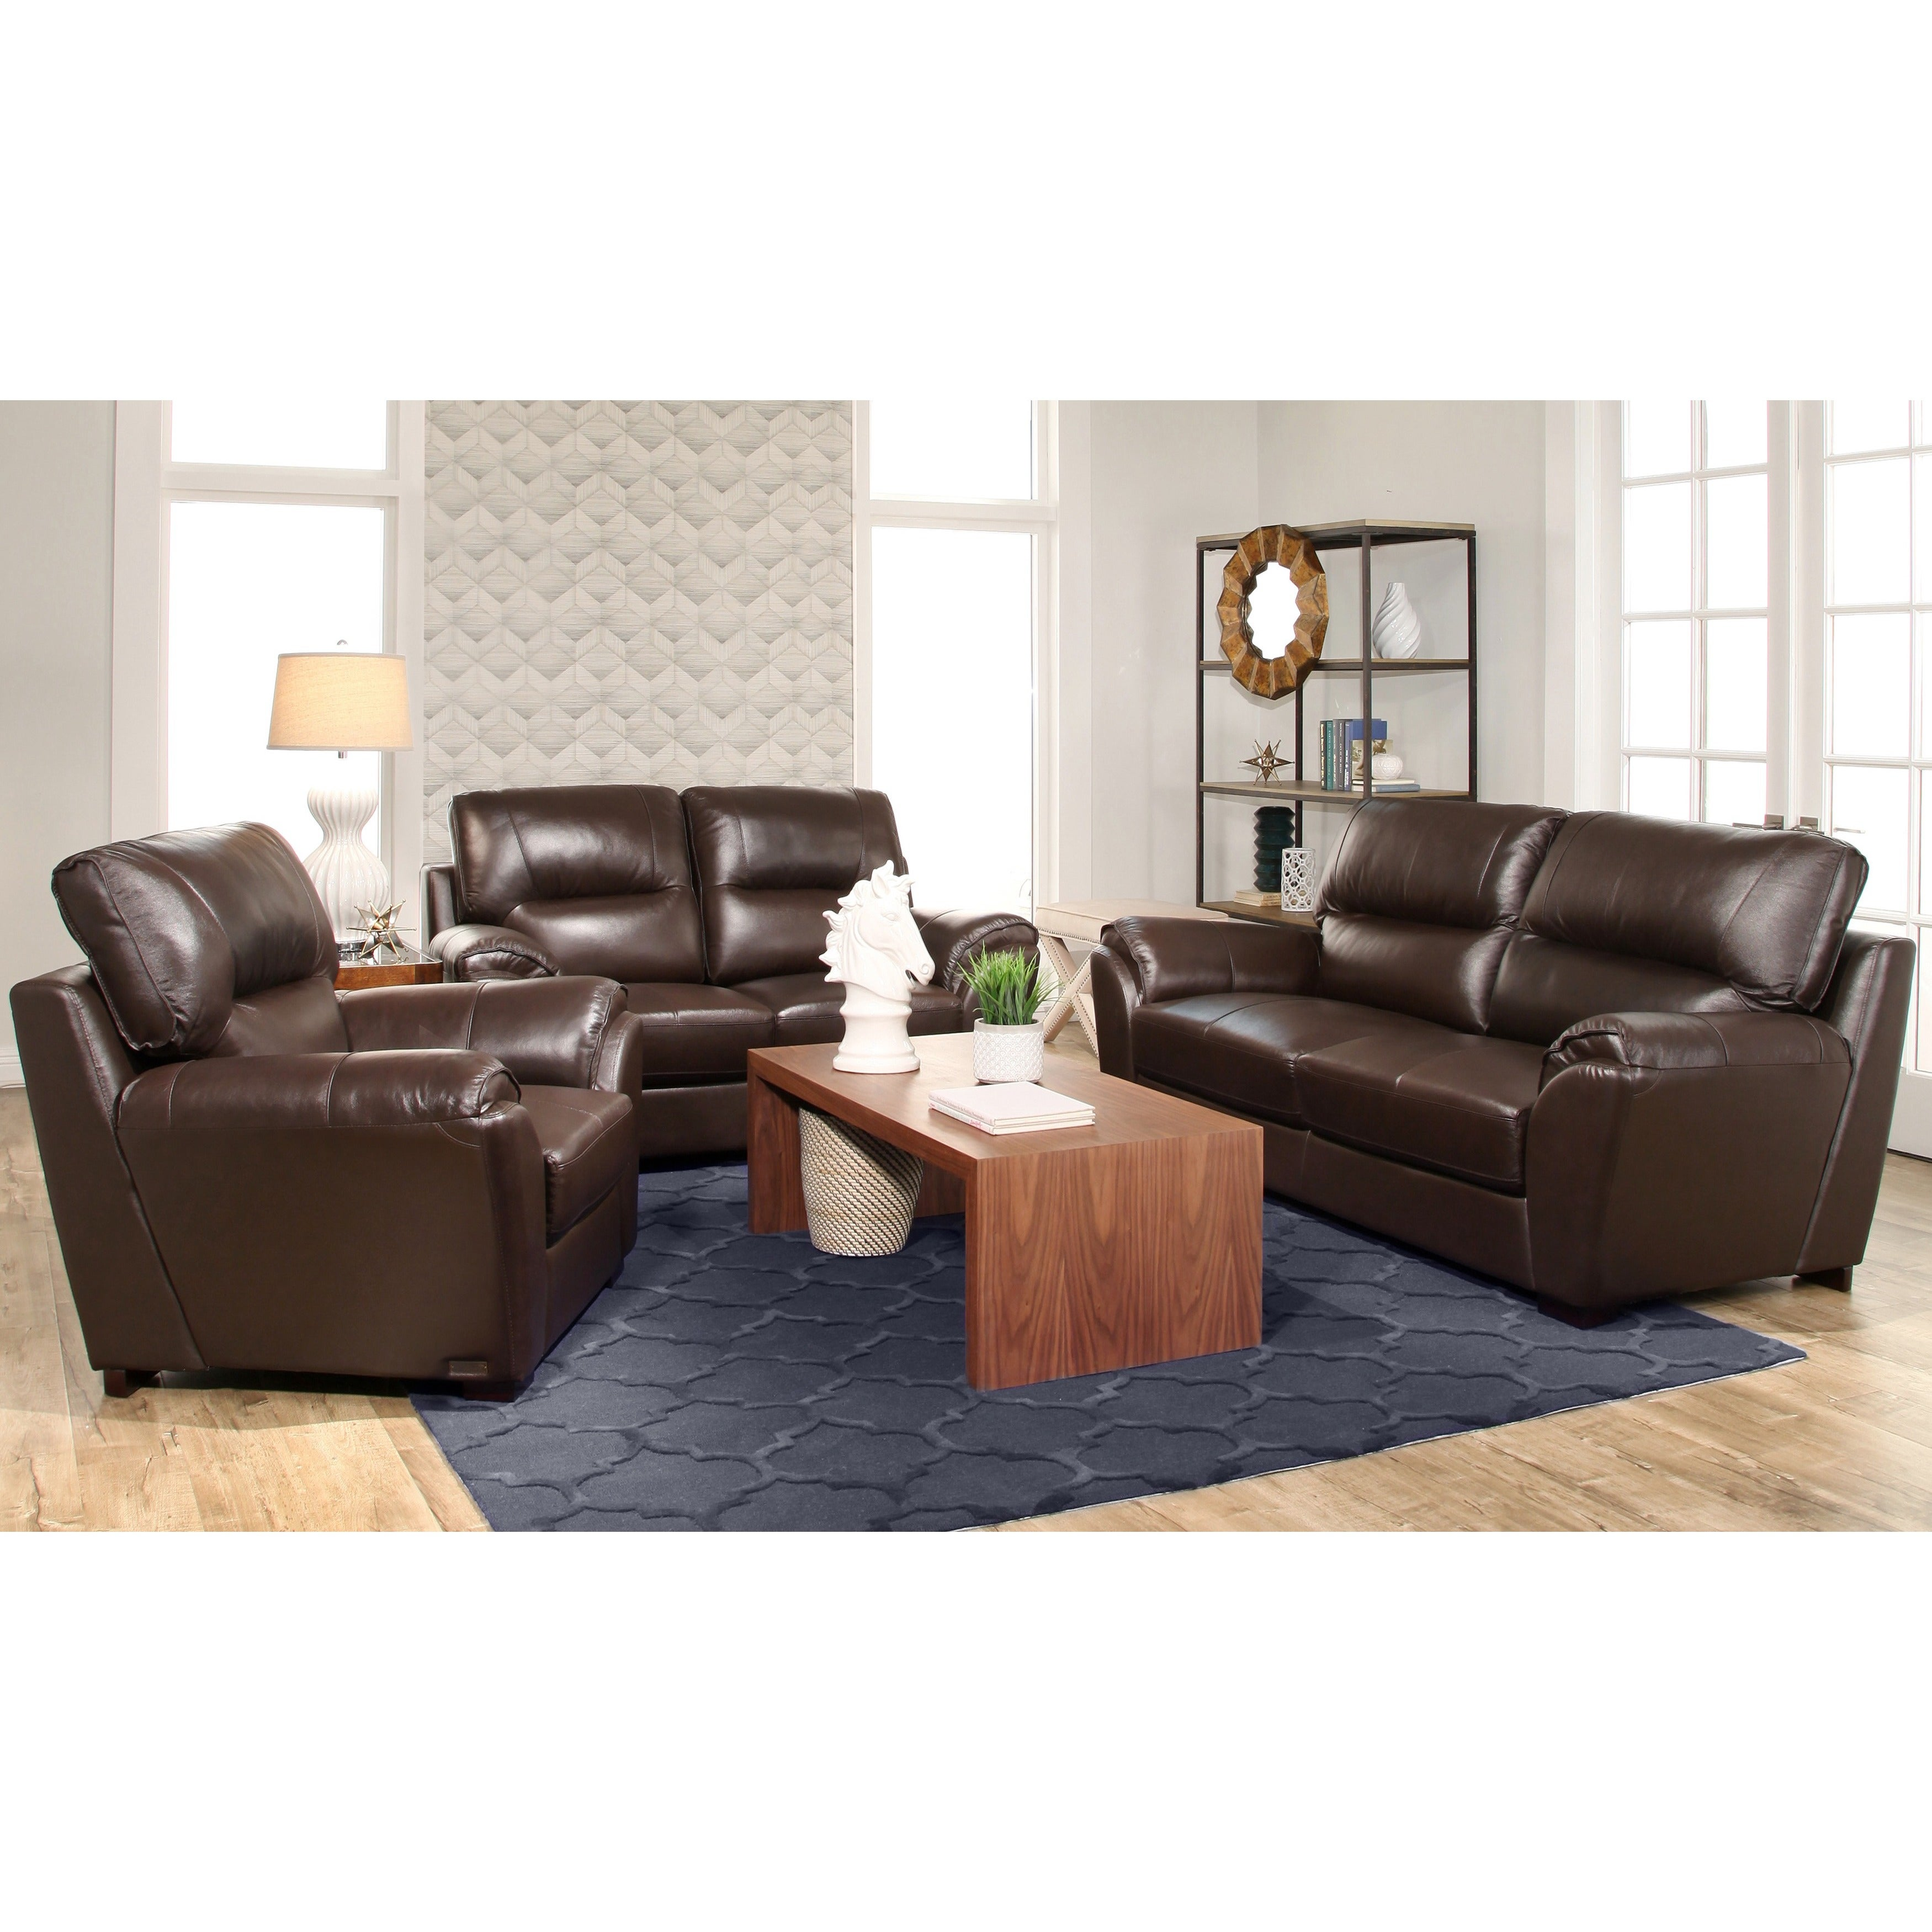 Abbyson Caprice 3 Piece Top Grain Leather Sofa Set Free Shipping  ~ Full Top Grain Leather Sofa